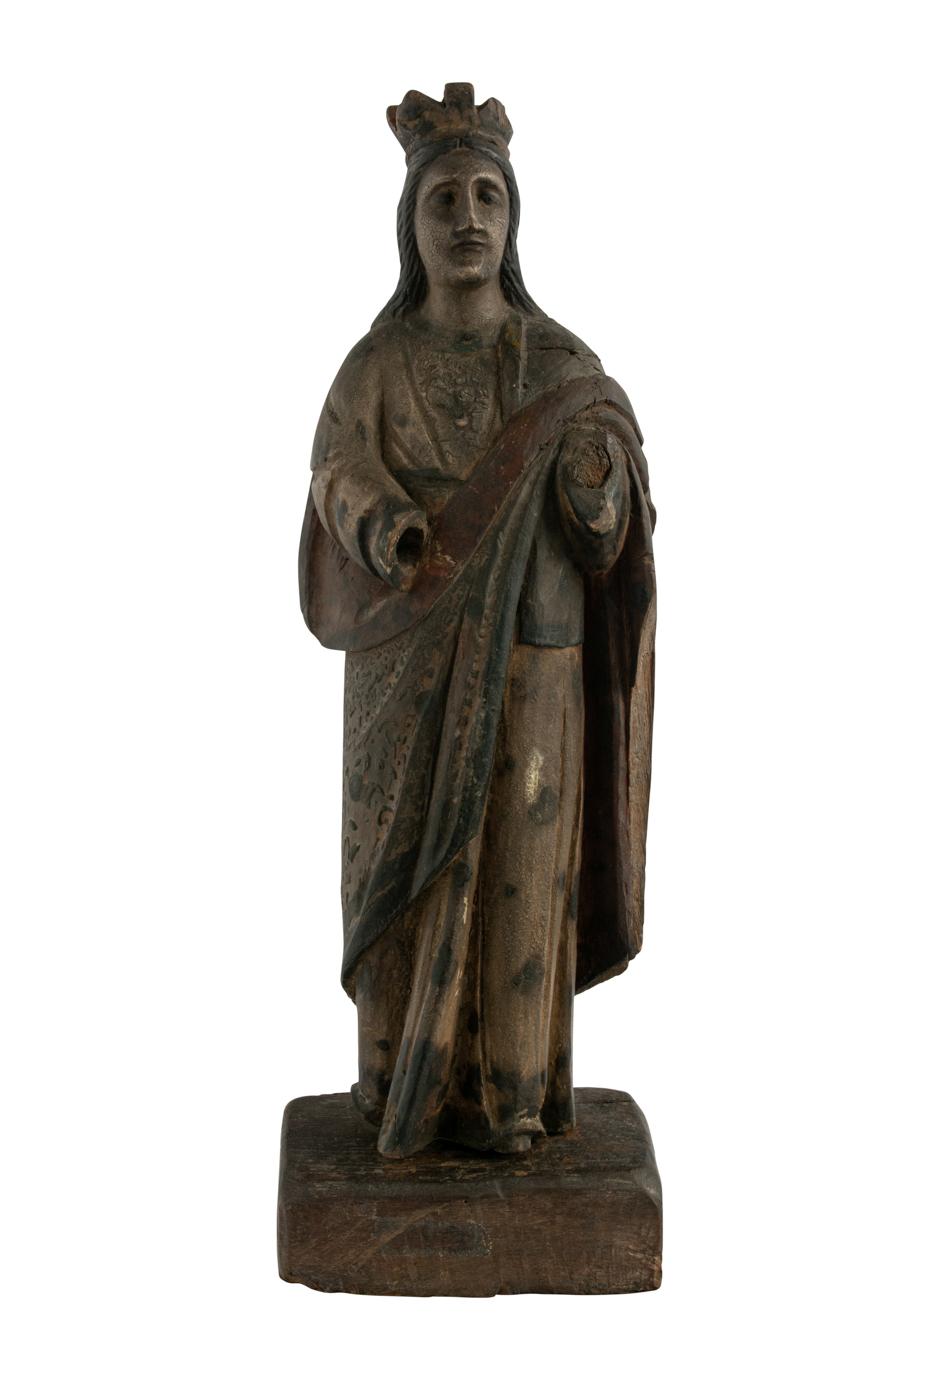 Escultura Sagrada de Filipinas en Madera Señora de Antipolo